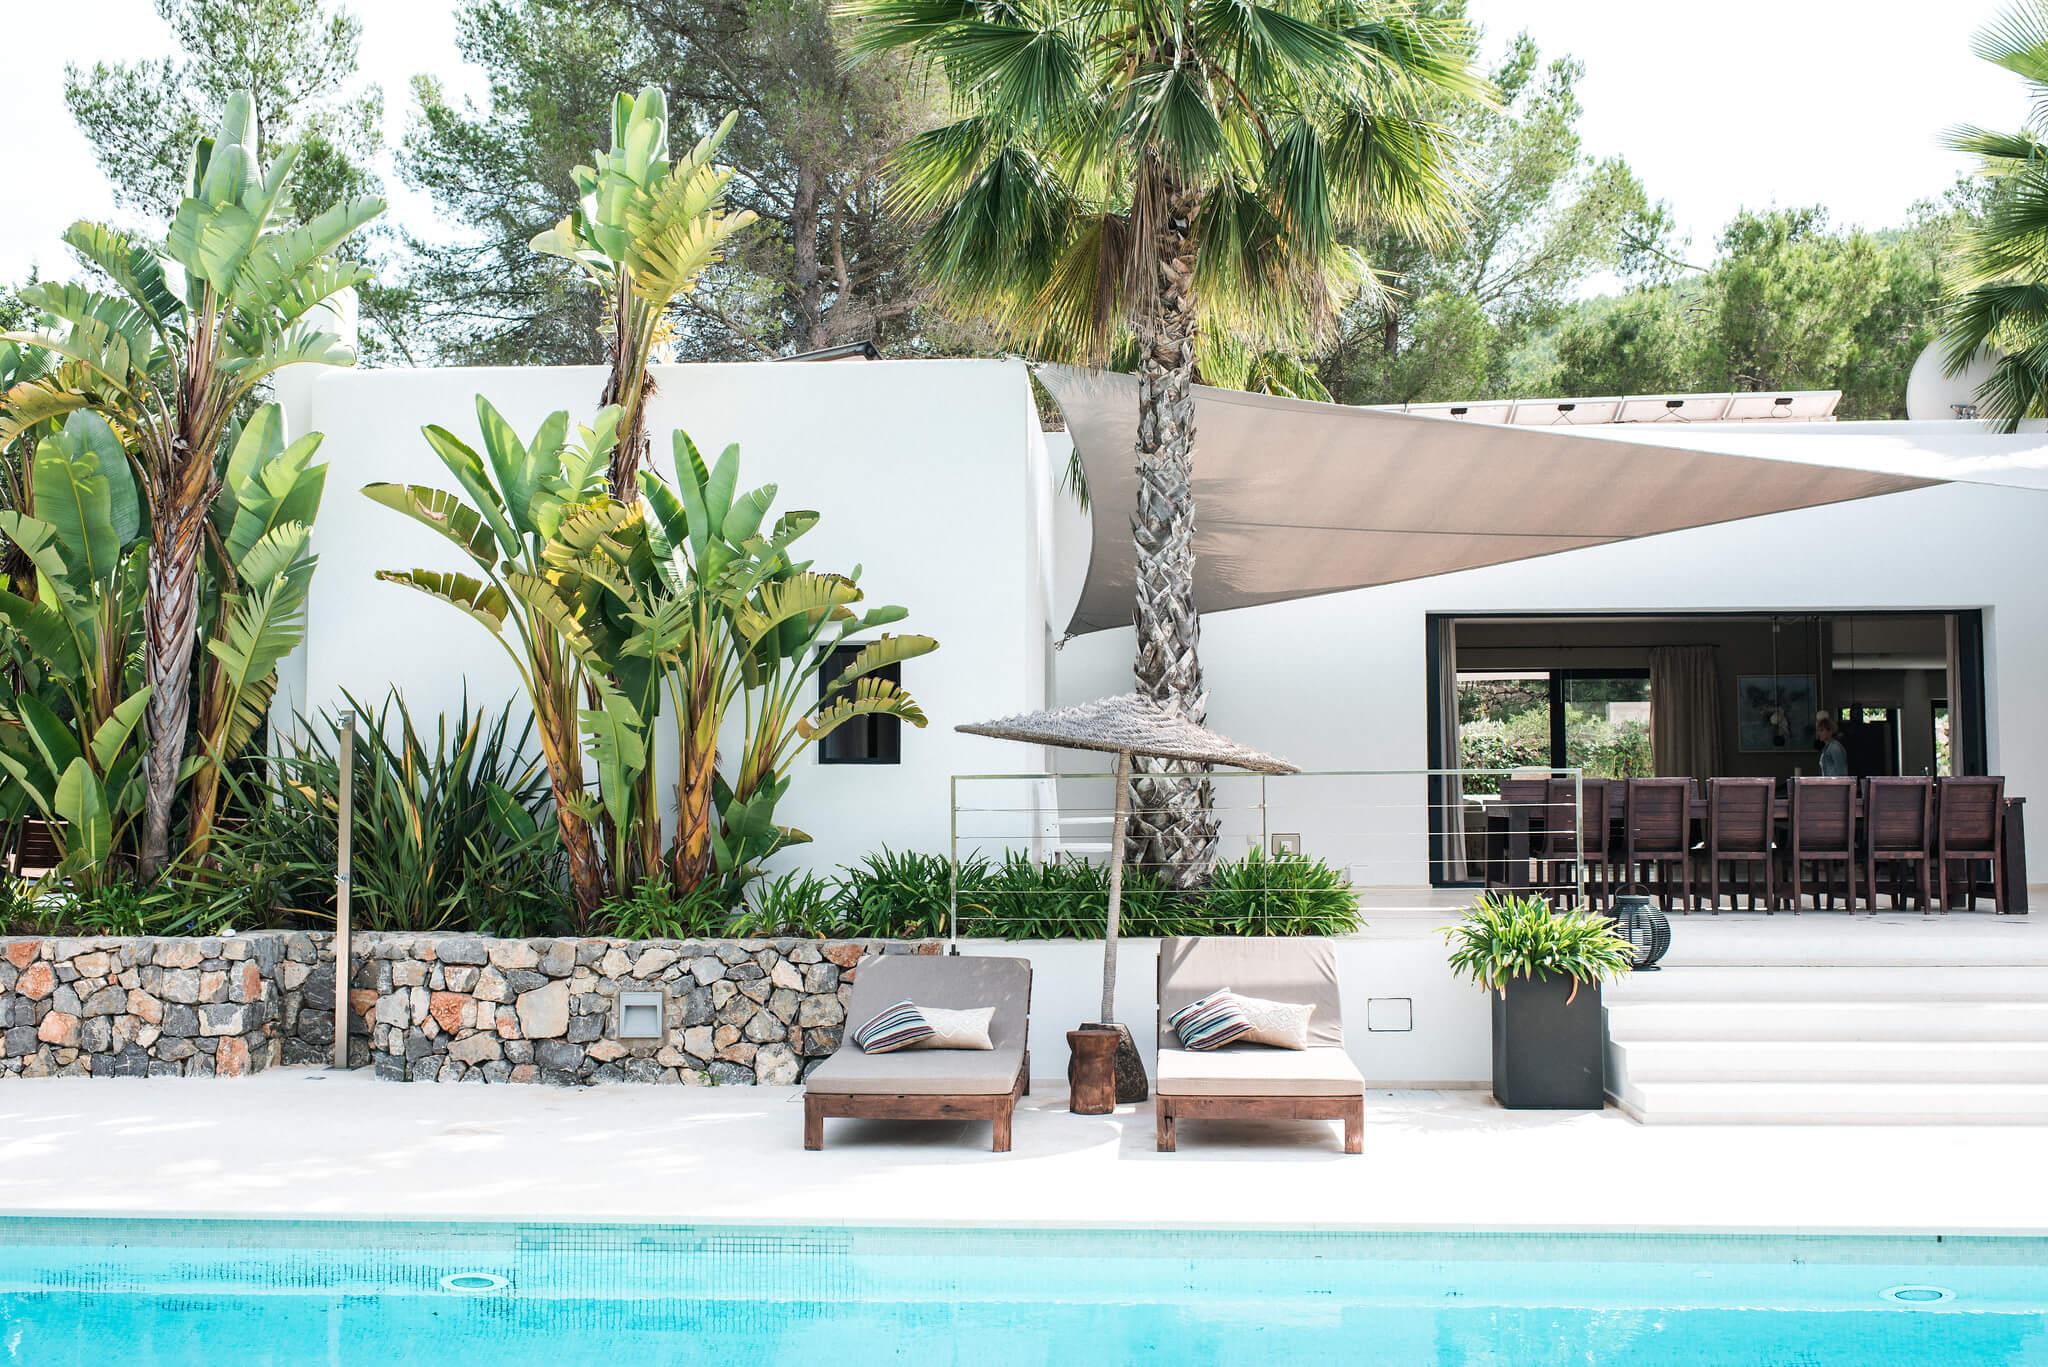 https://www.white-ibiza.com/wp-content/uploads/2020/05/white-ibiza-villas-casa-estrella-exterior-view-across-pool.jpg